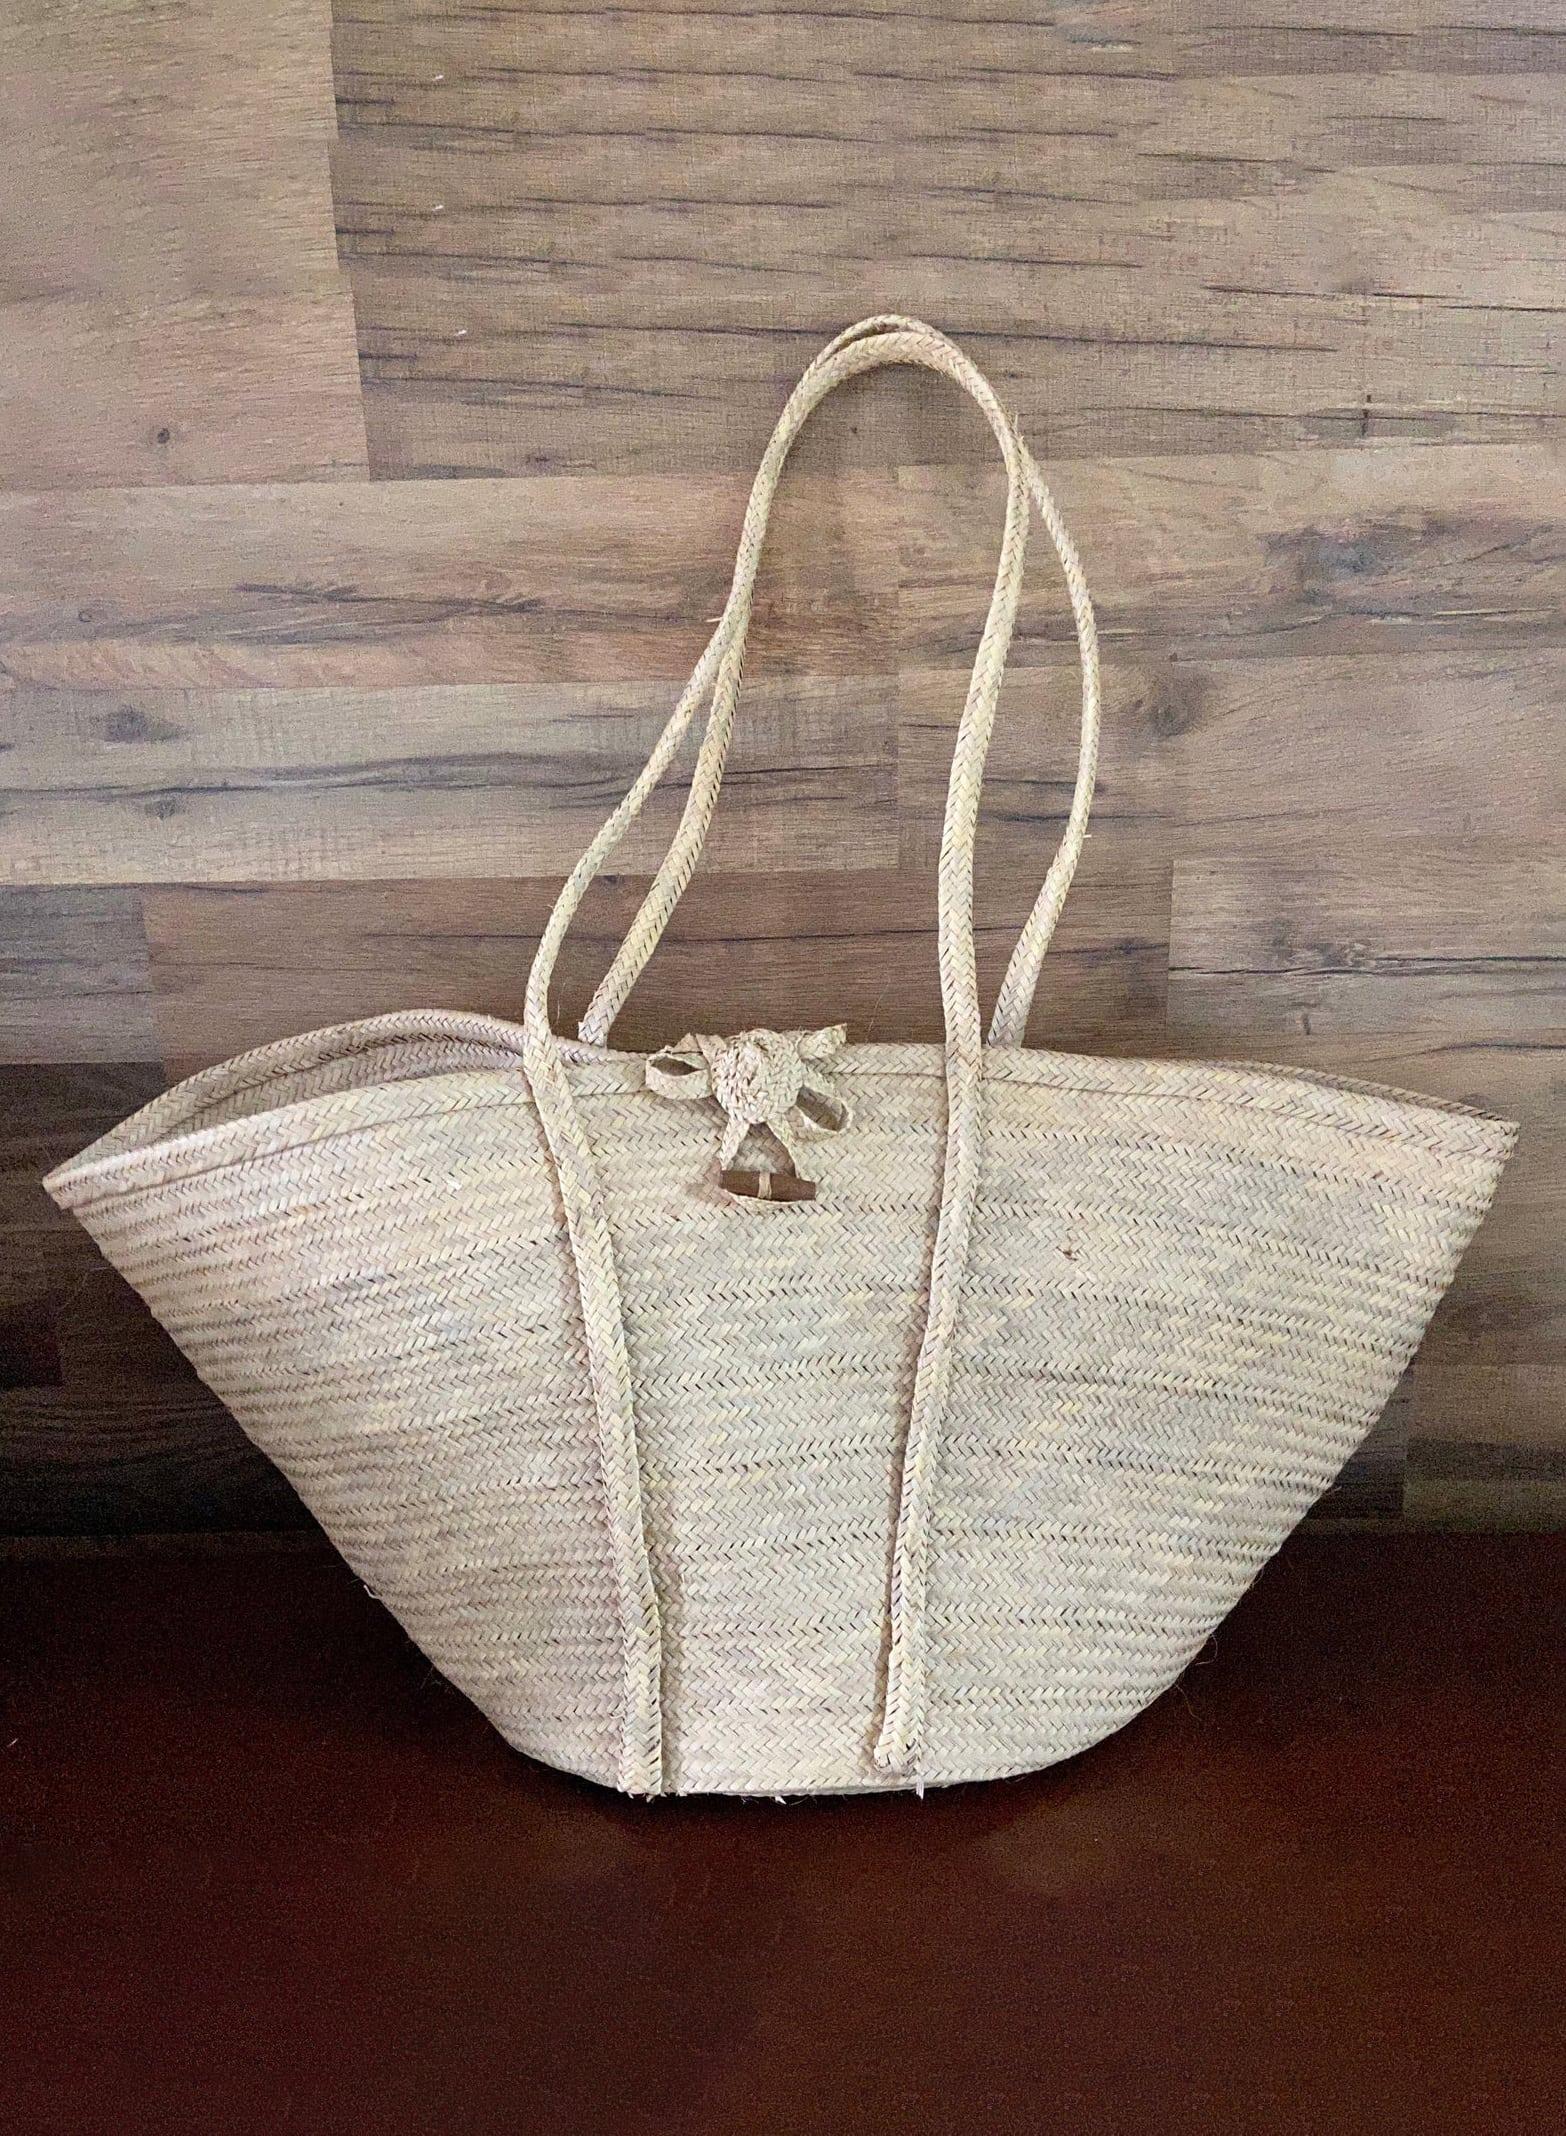 Vintage Handwoven Tote:Beach bag